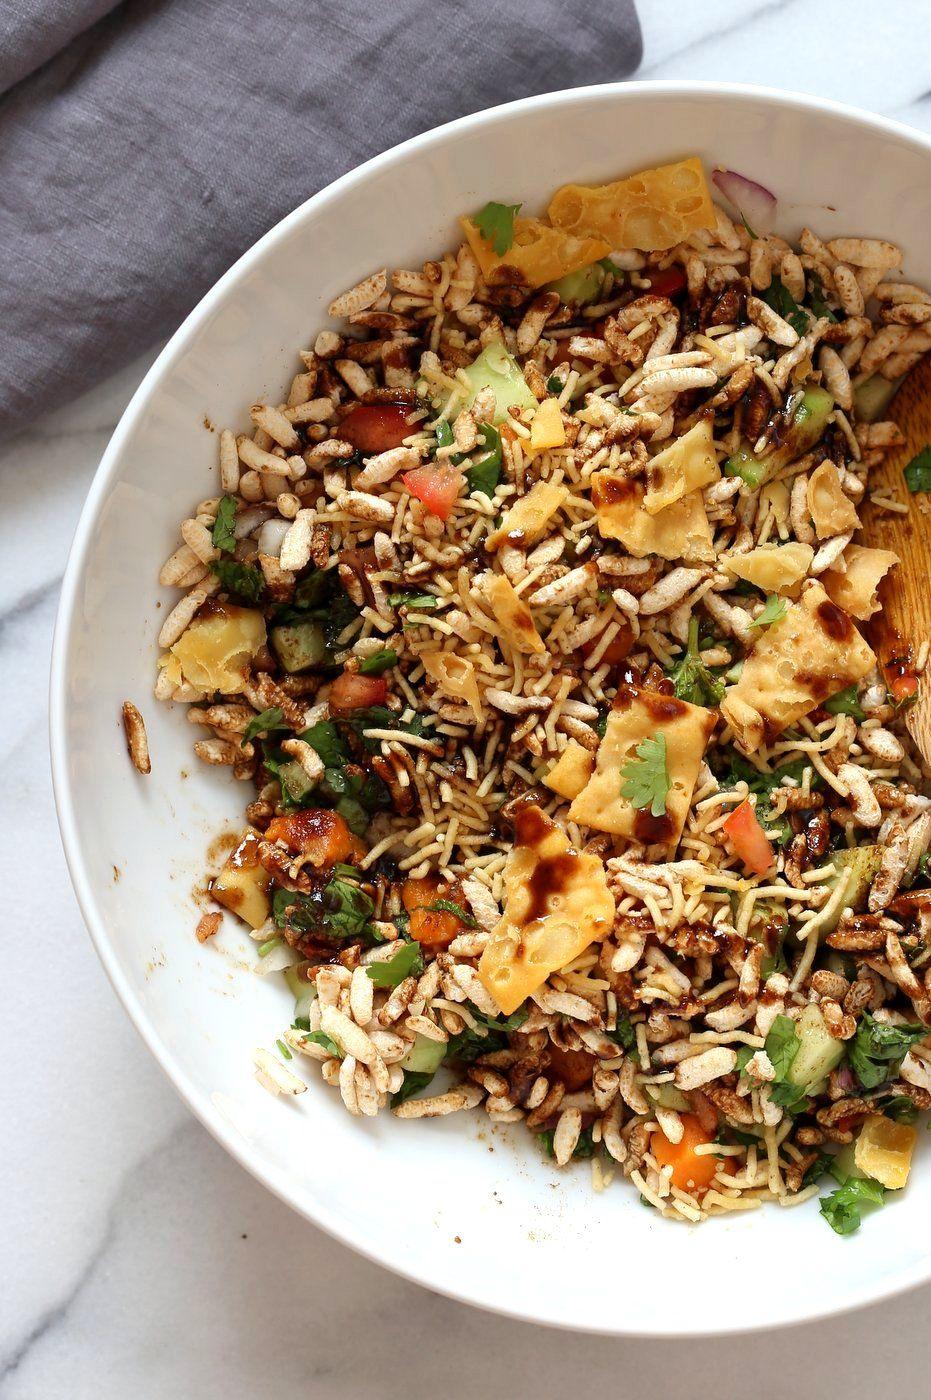 Sweet Potato Bhel Recipe Indian Snack Salad With Puffed Rice Mint And Tamarind Chutney Vegan Richa Recipe Bhel Recipe Recipes Puri Recipes